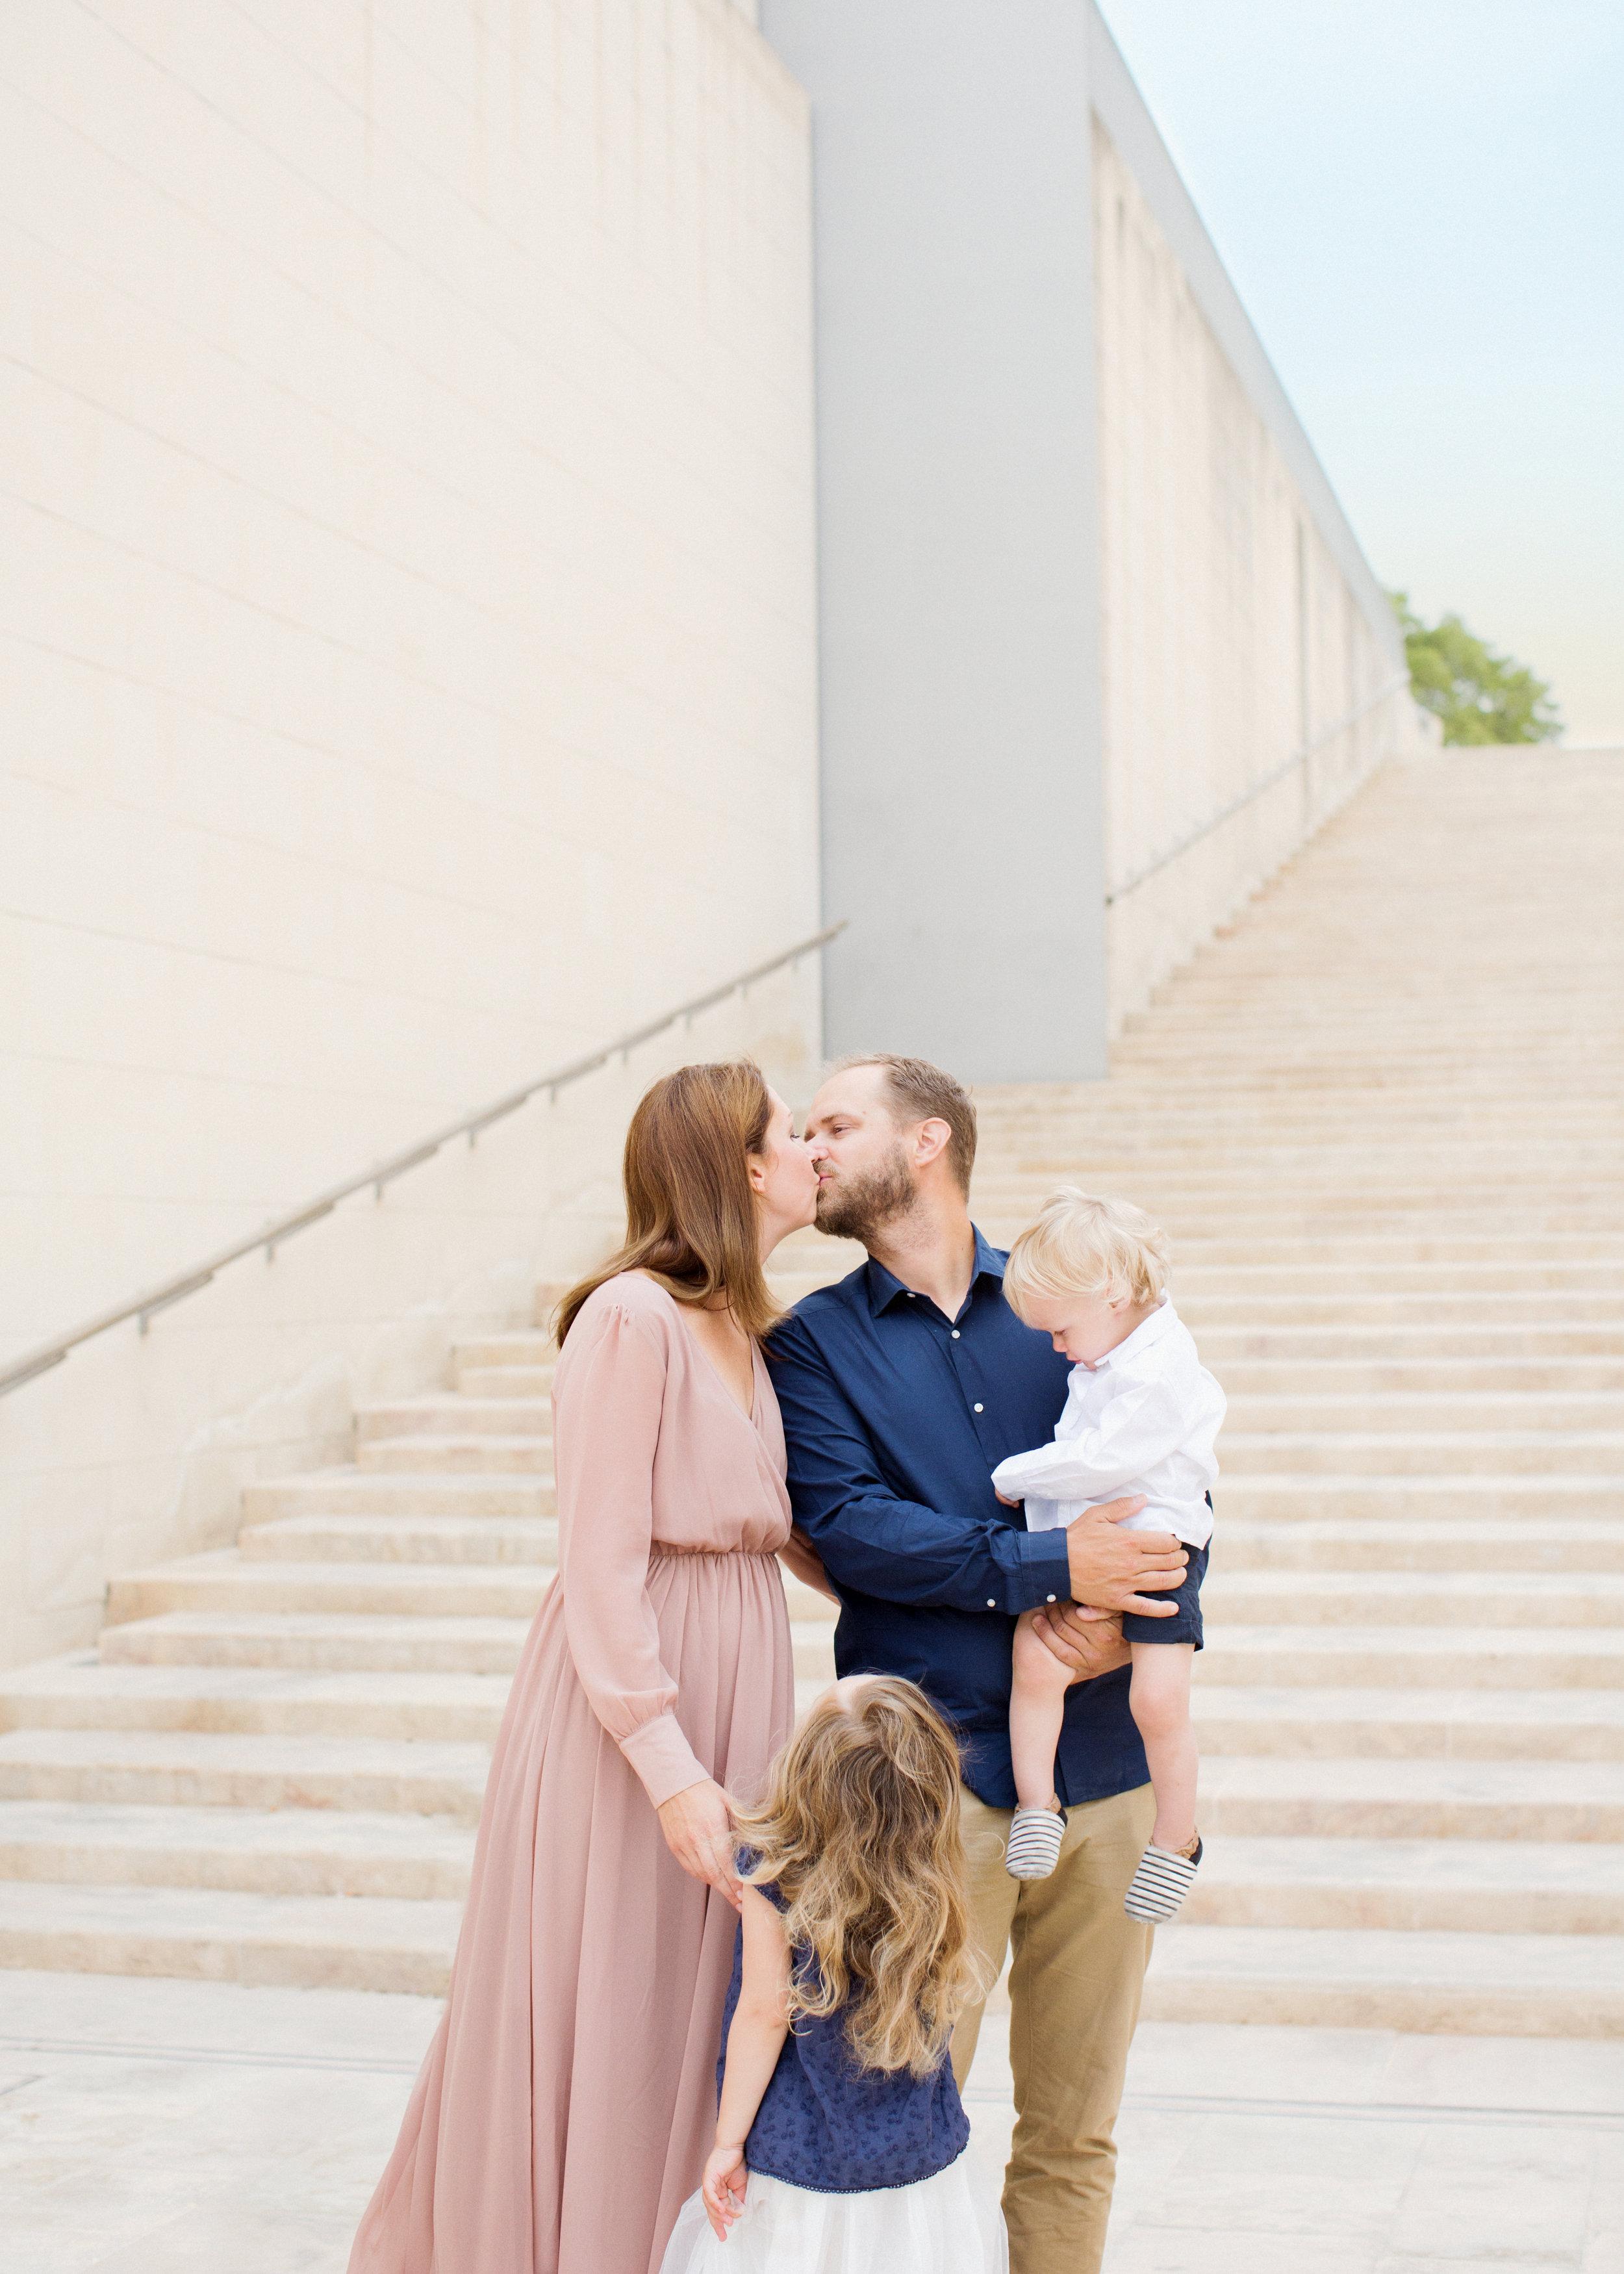 valletta photoshoot, malta family photo shoot, natural light photographer, relaxed photo session, family of four, swedish photographer malta,